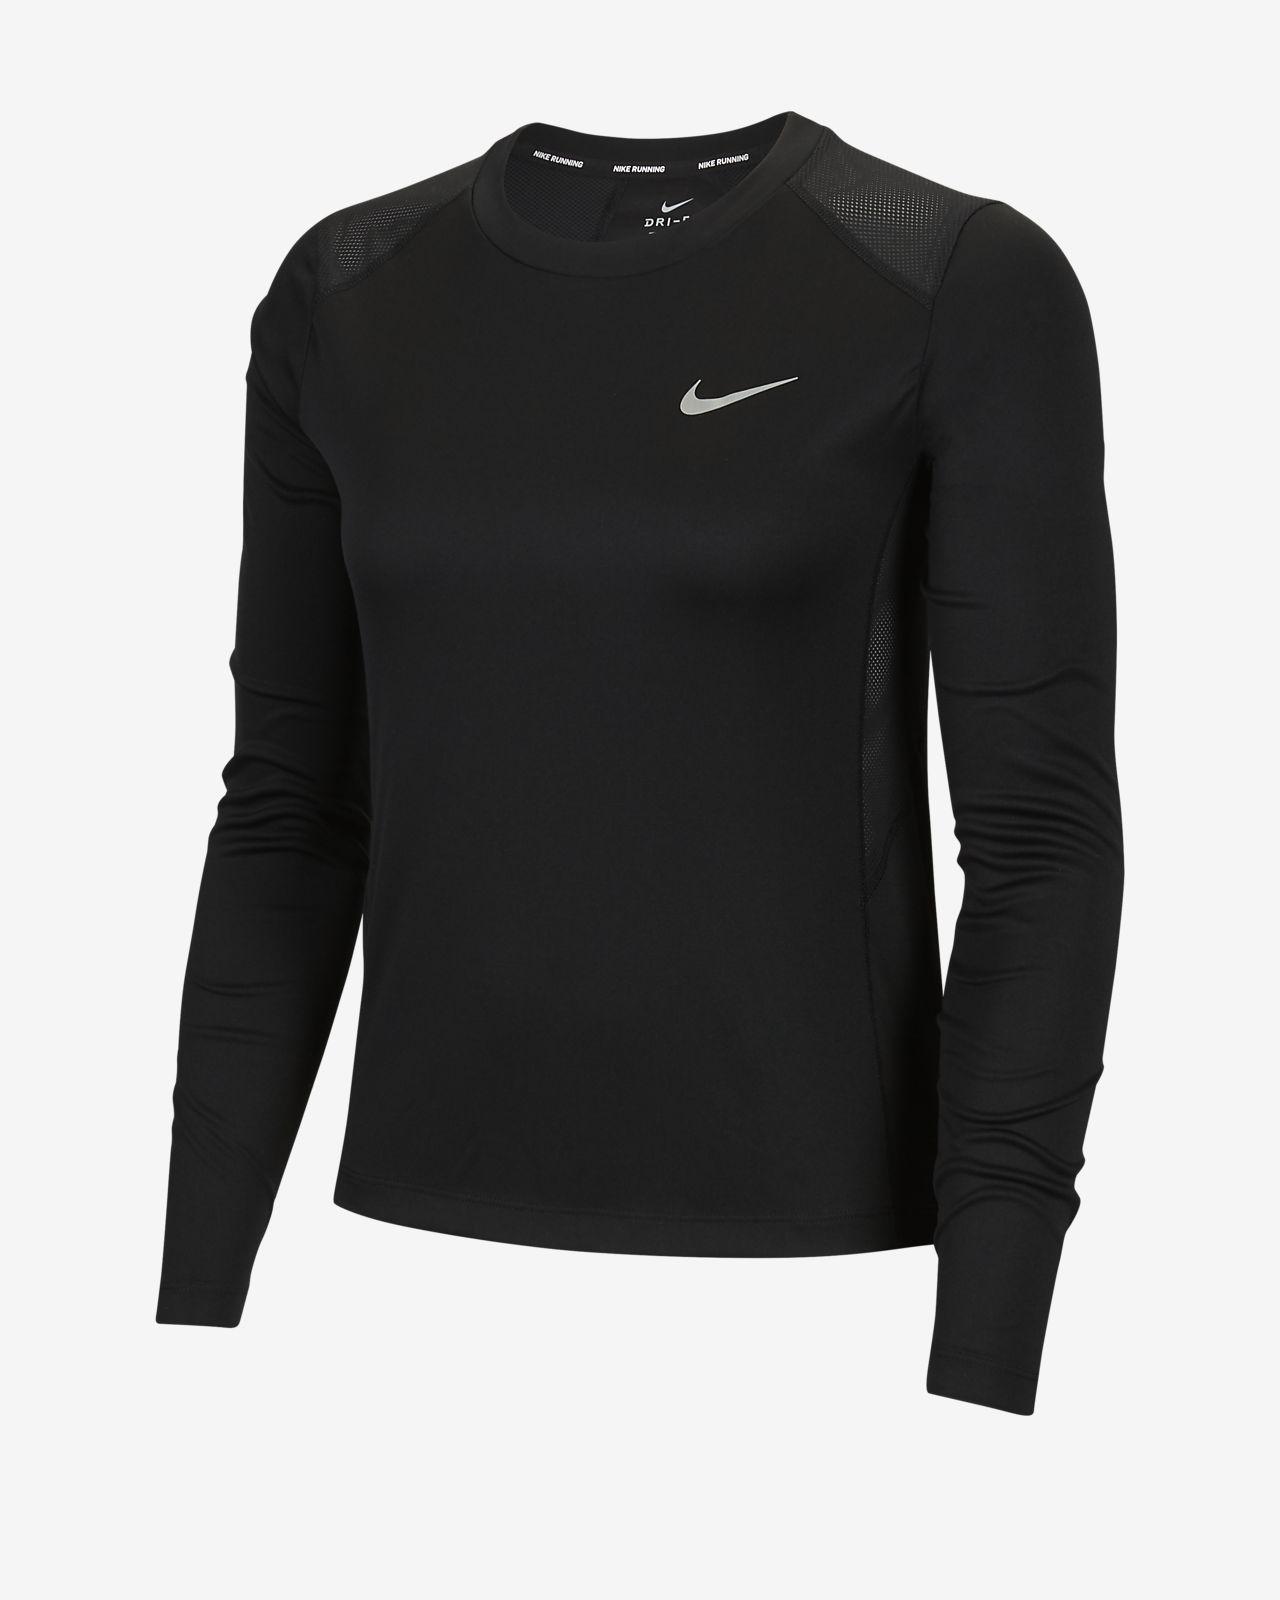 nike dri fit long sleeve shirts clearance